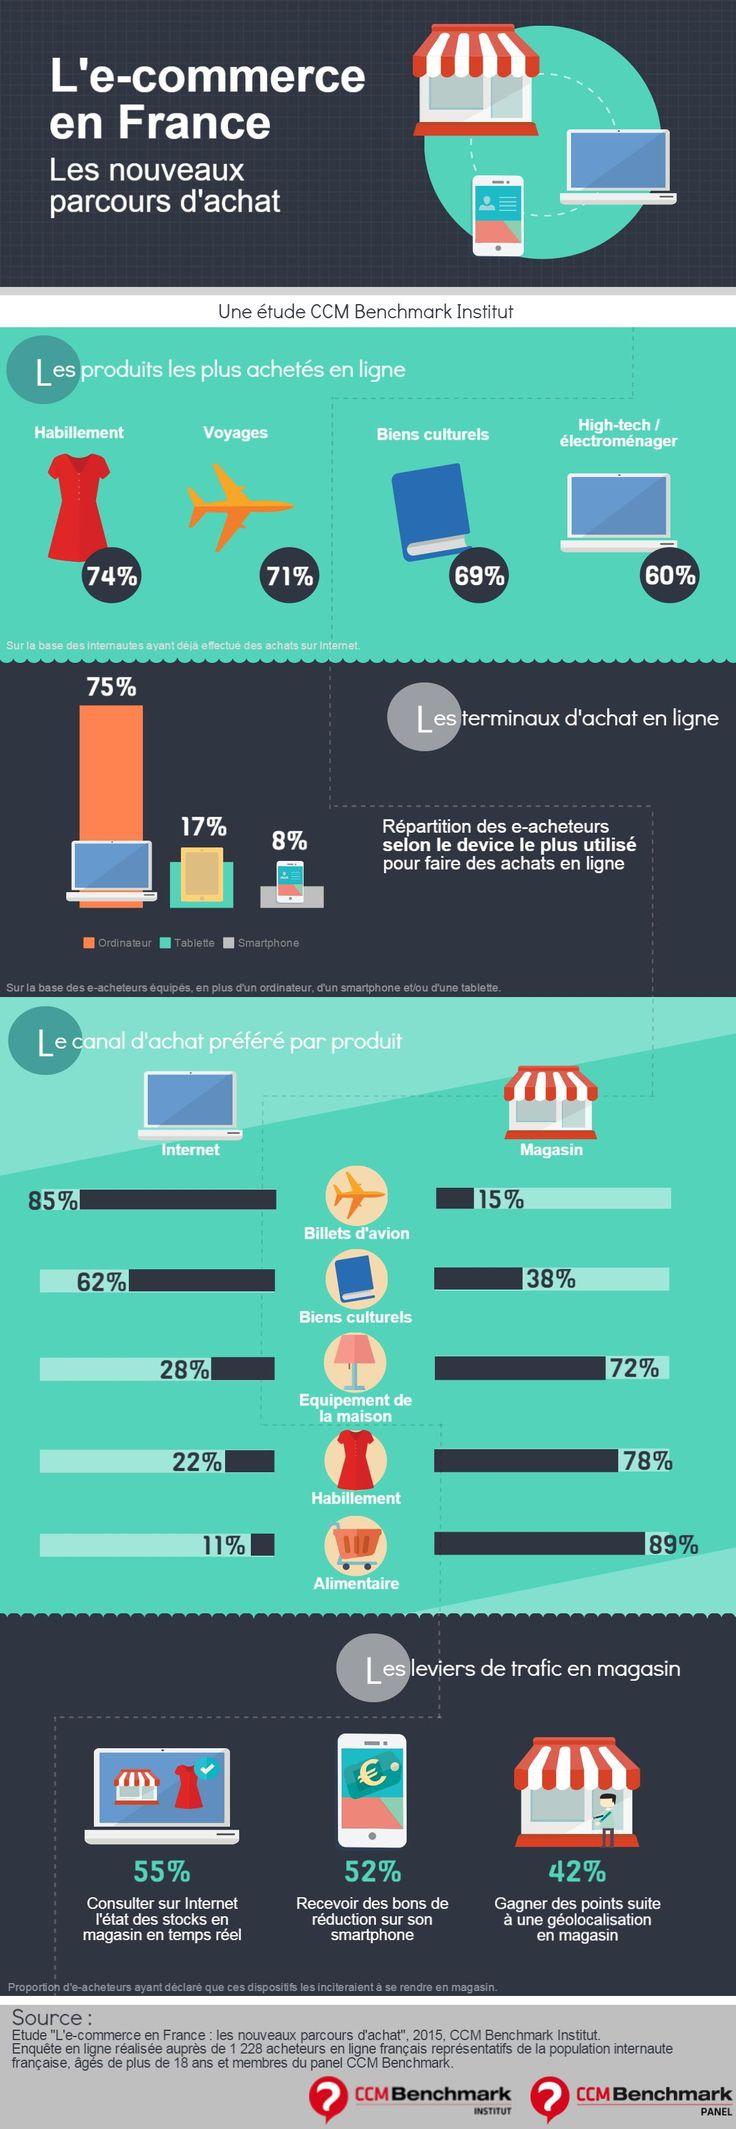 Etude L'e-commerce en France CCM Benchmark